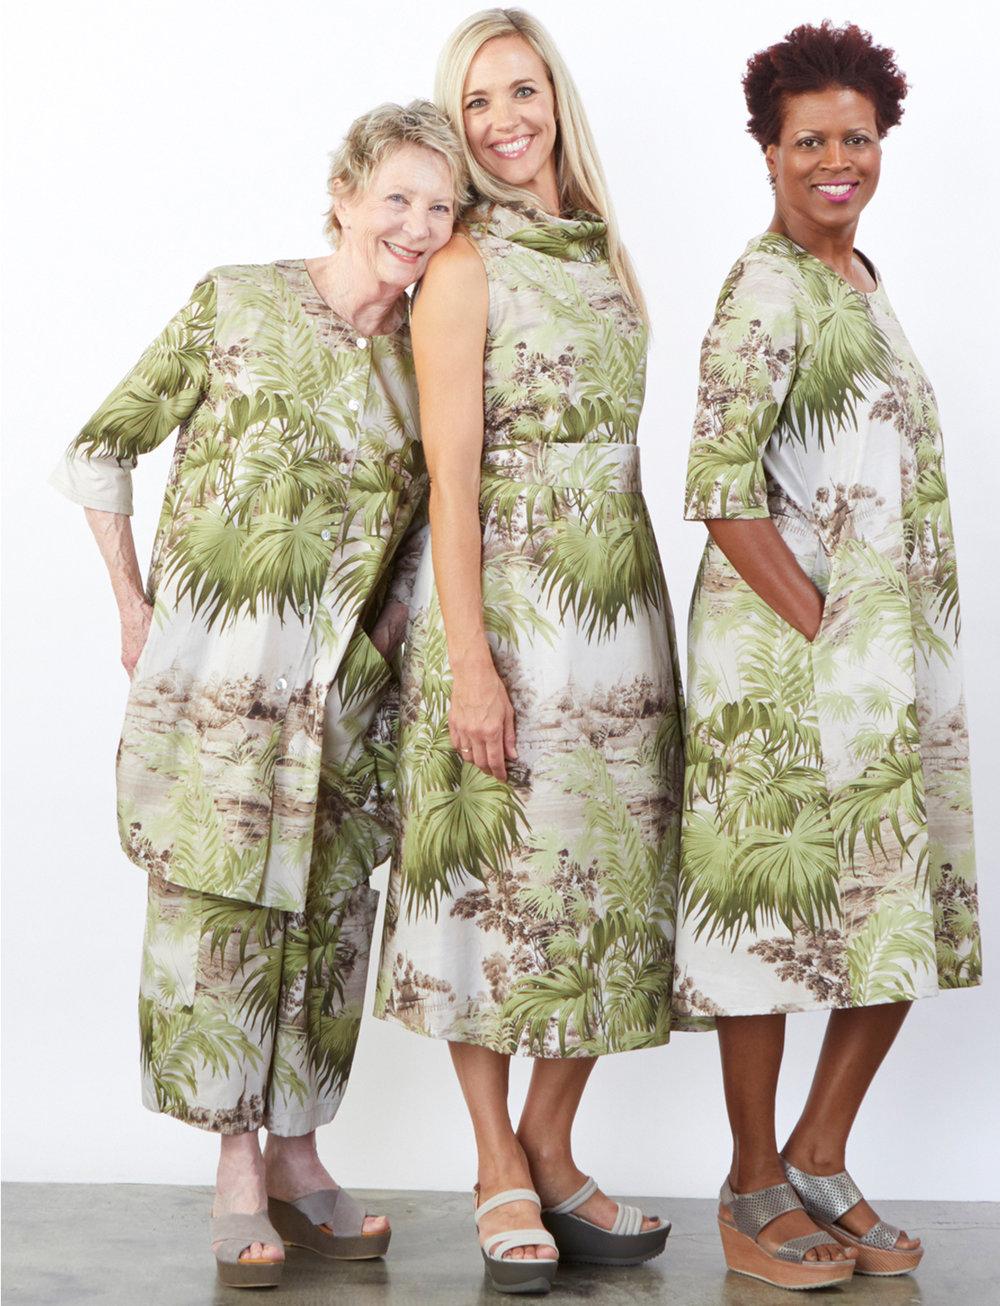 Gillian Jacket, Henrietta Dress, Homer Dress, Casbah Pant in Ready for Ubud